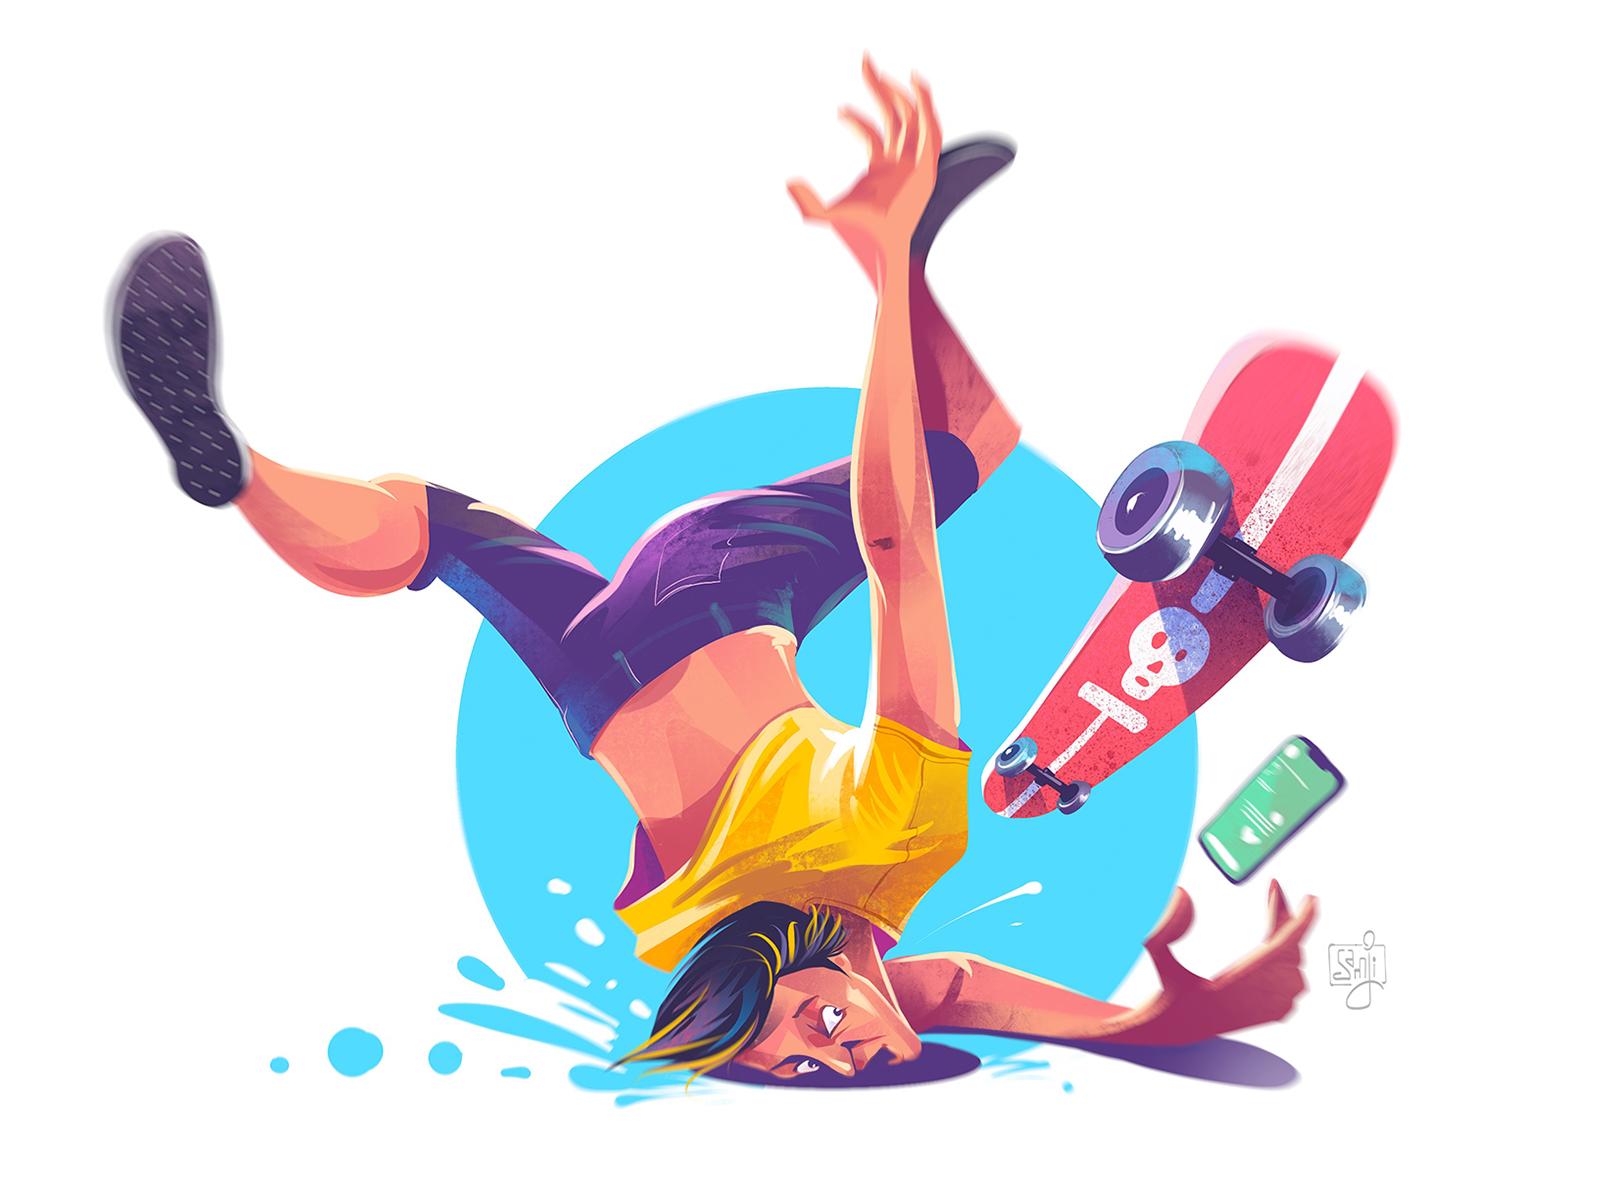 Samji illustrator